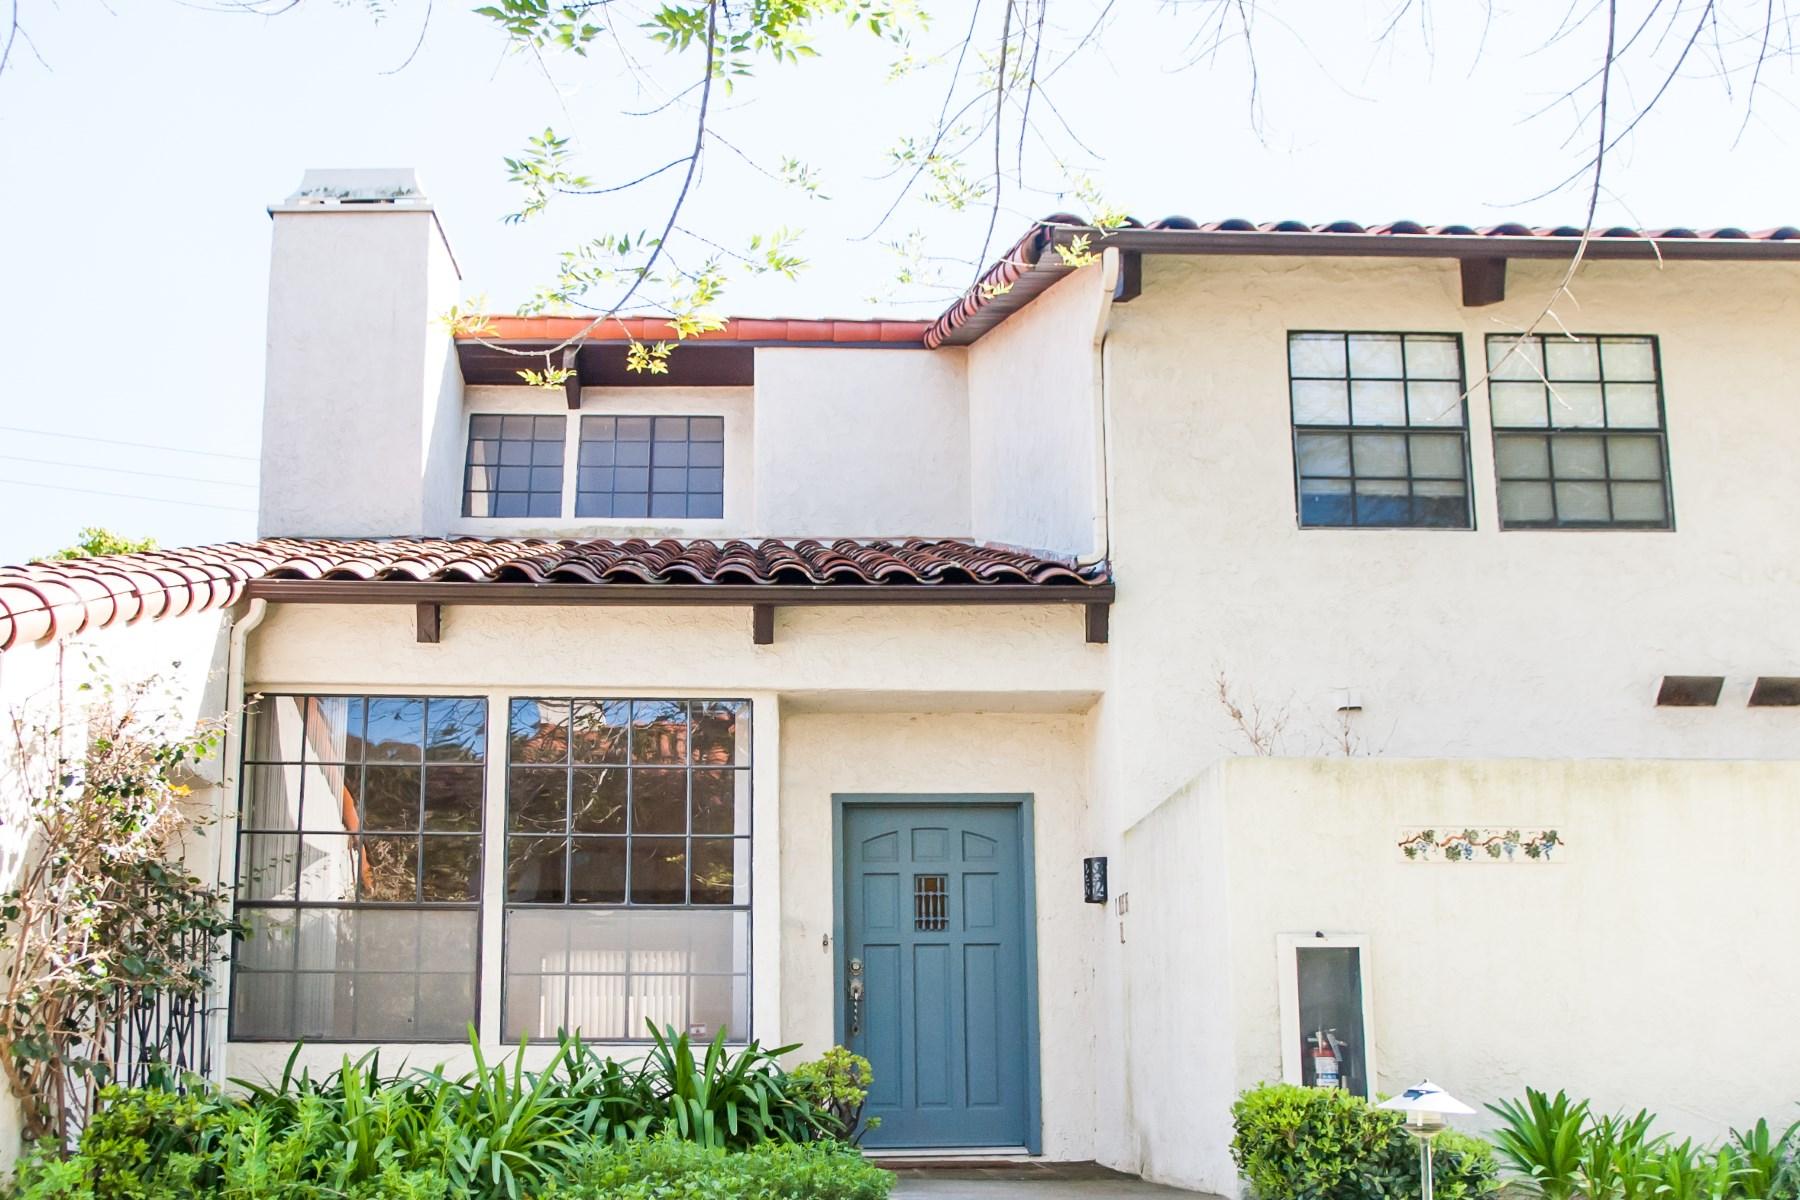 联栋屋 为 销售 在 Sought-After Montecito Townhouse 1944 North Jameson Lane Unit D Montecito - Upper Village, 圣巴巴拉市, 加利福尼亚州, 93108 美国